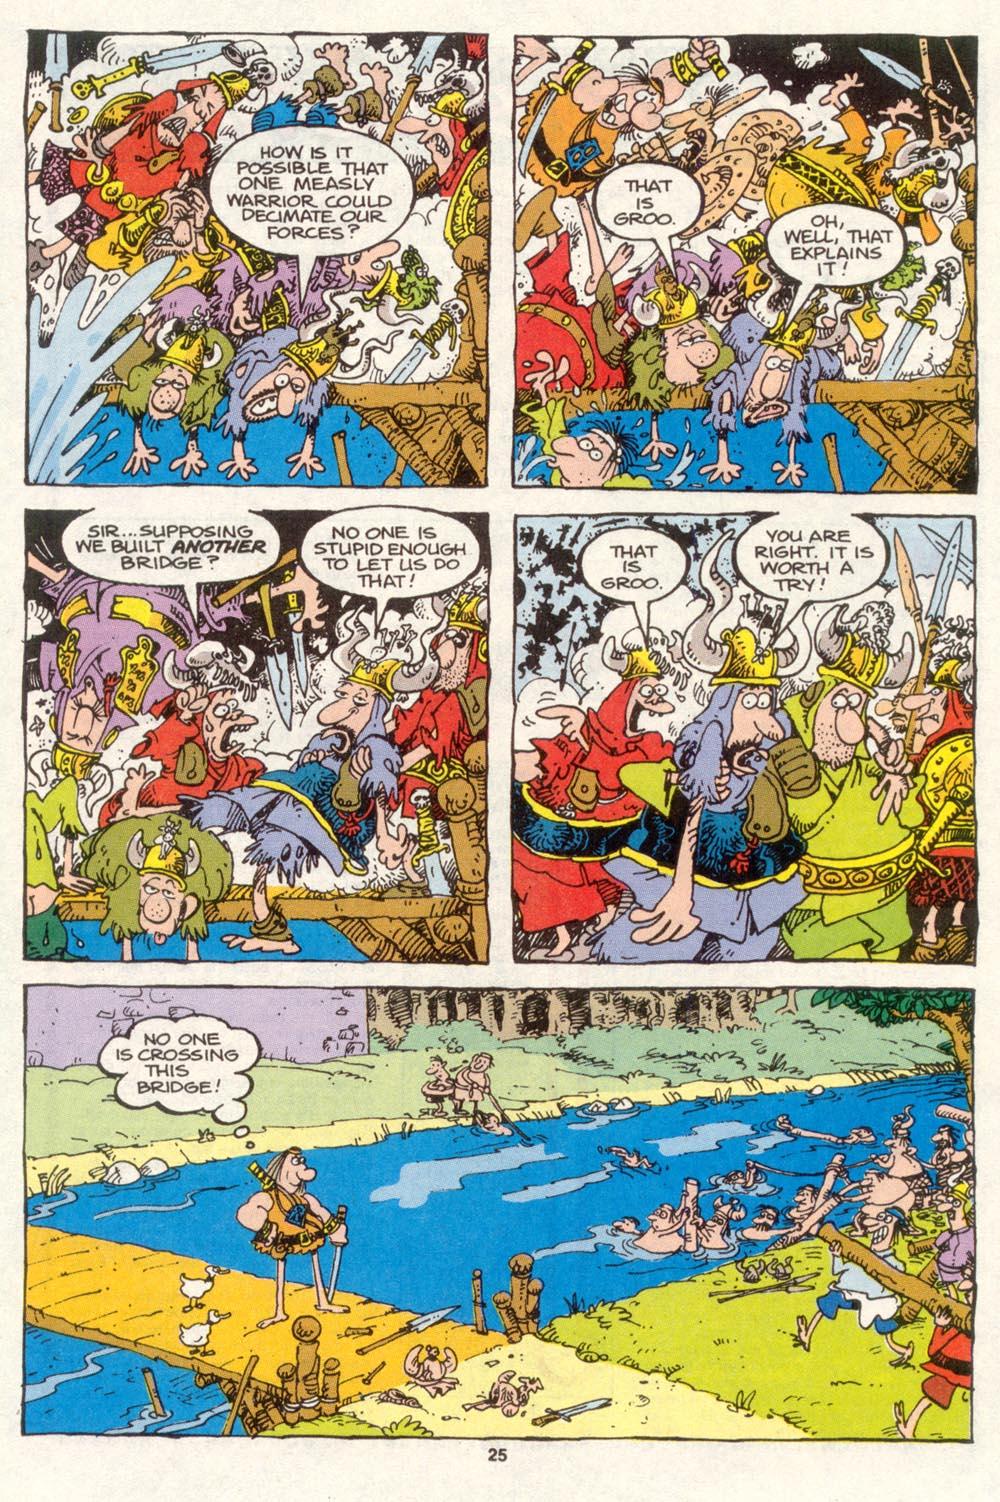 Read online Sergio Aragonés Groo the Wanderer comic -  Issue #86 - 20